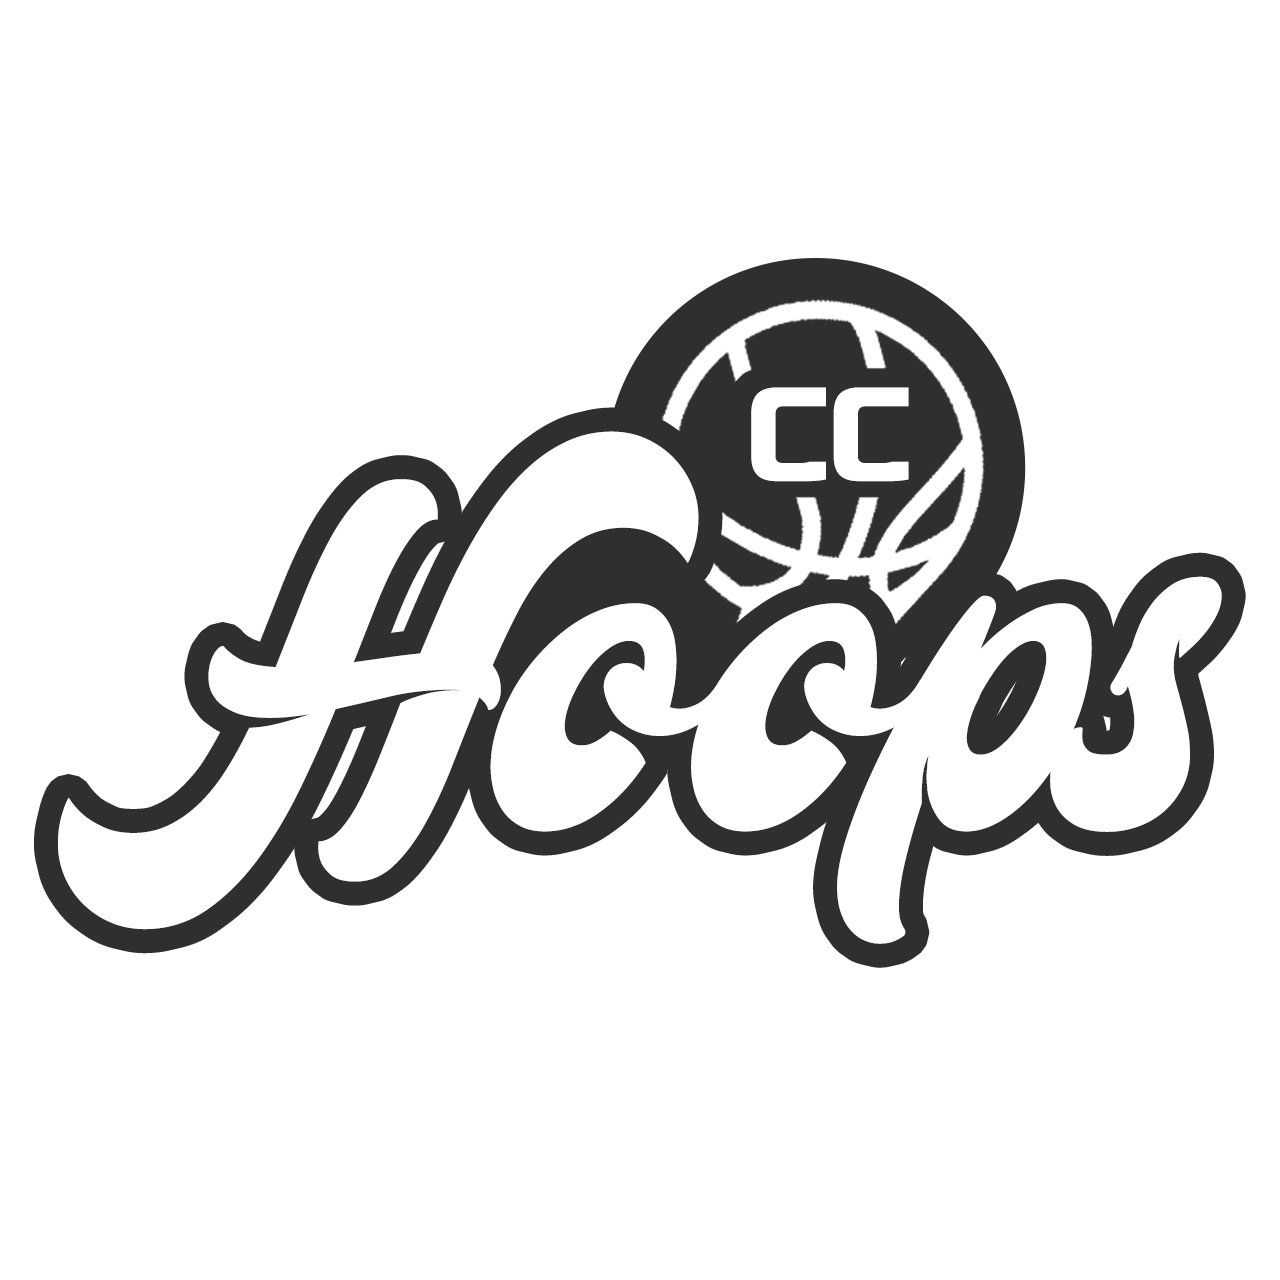 CC Hoops.png